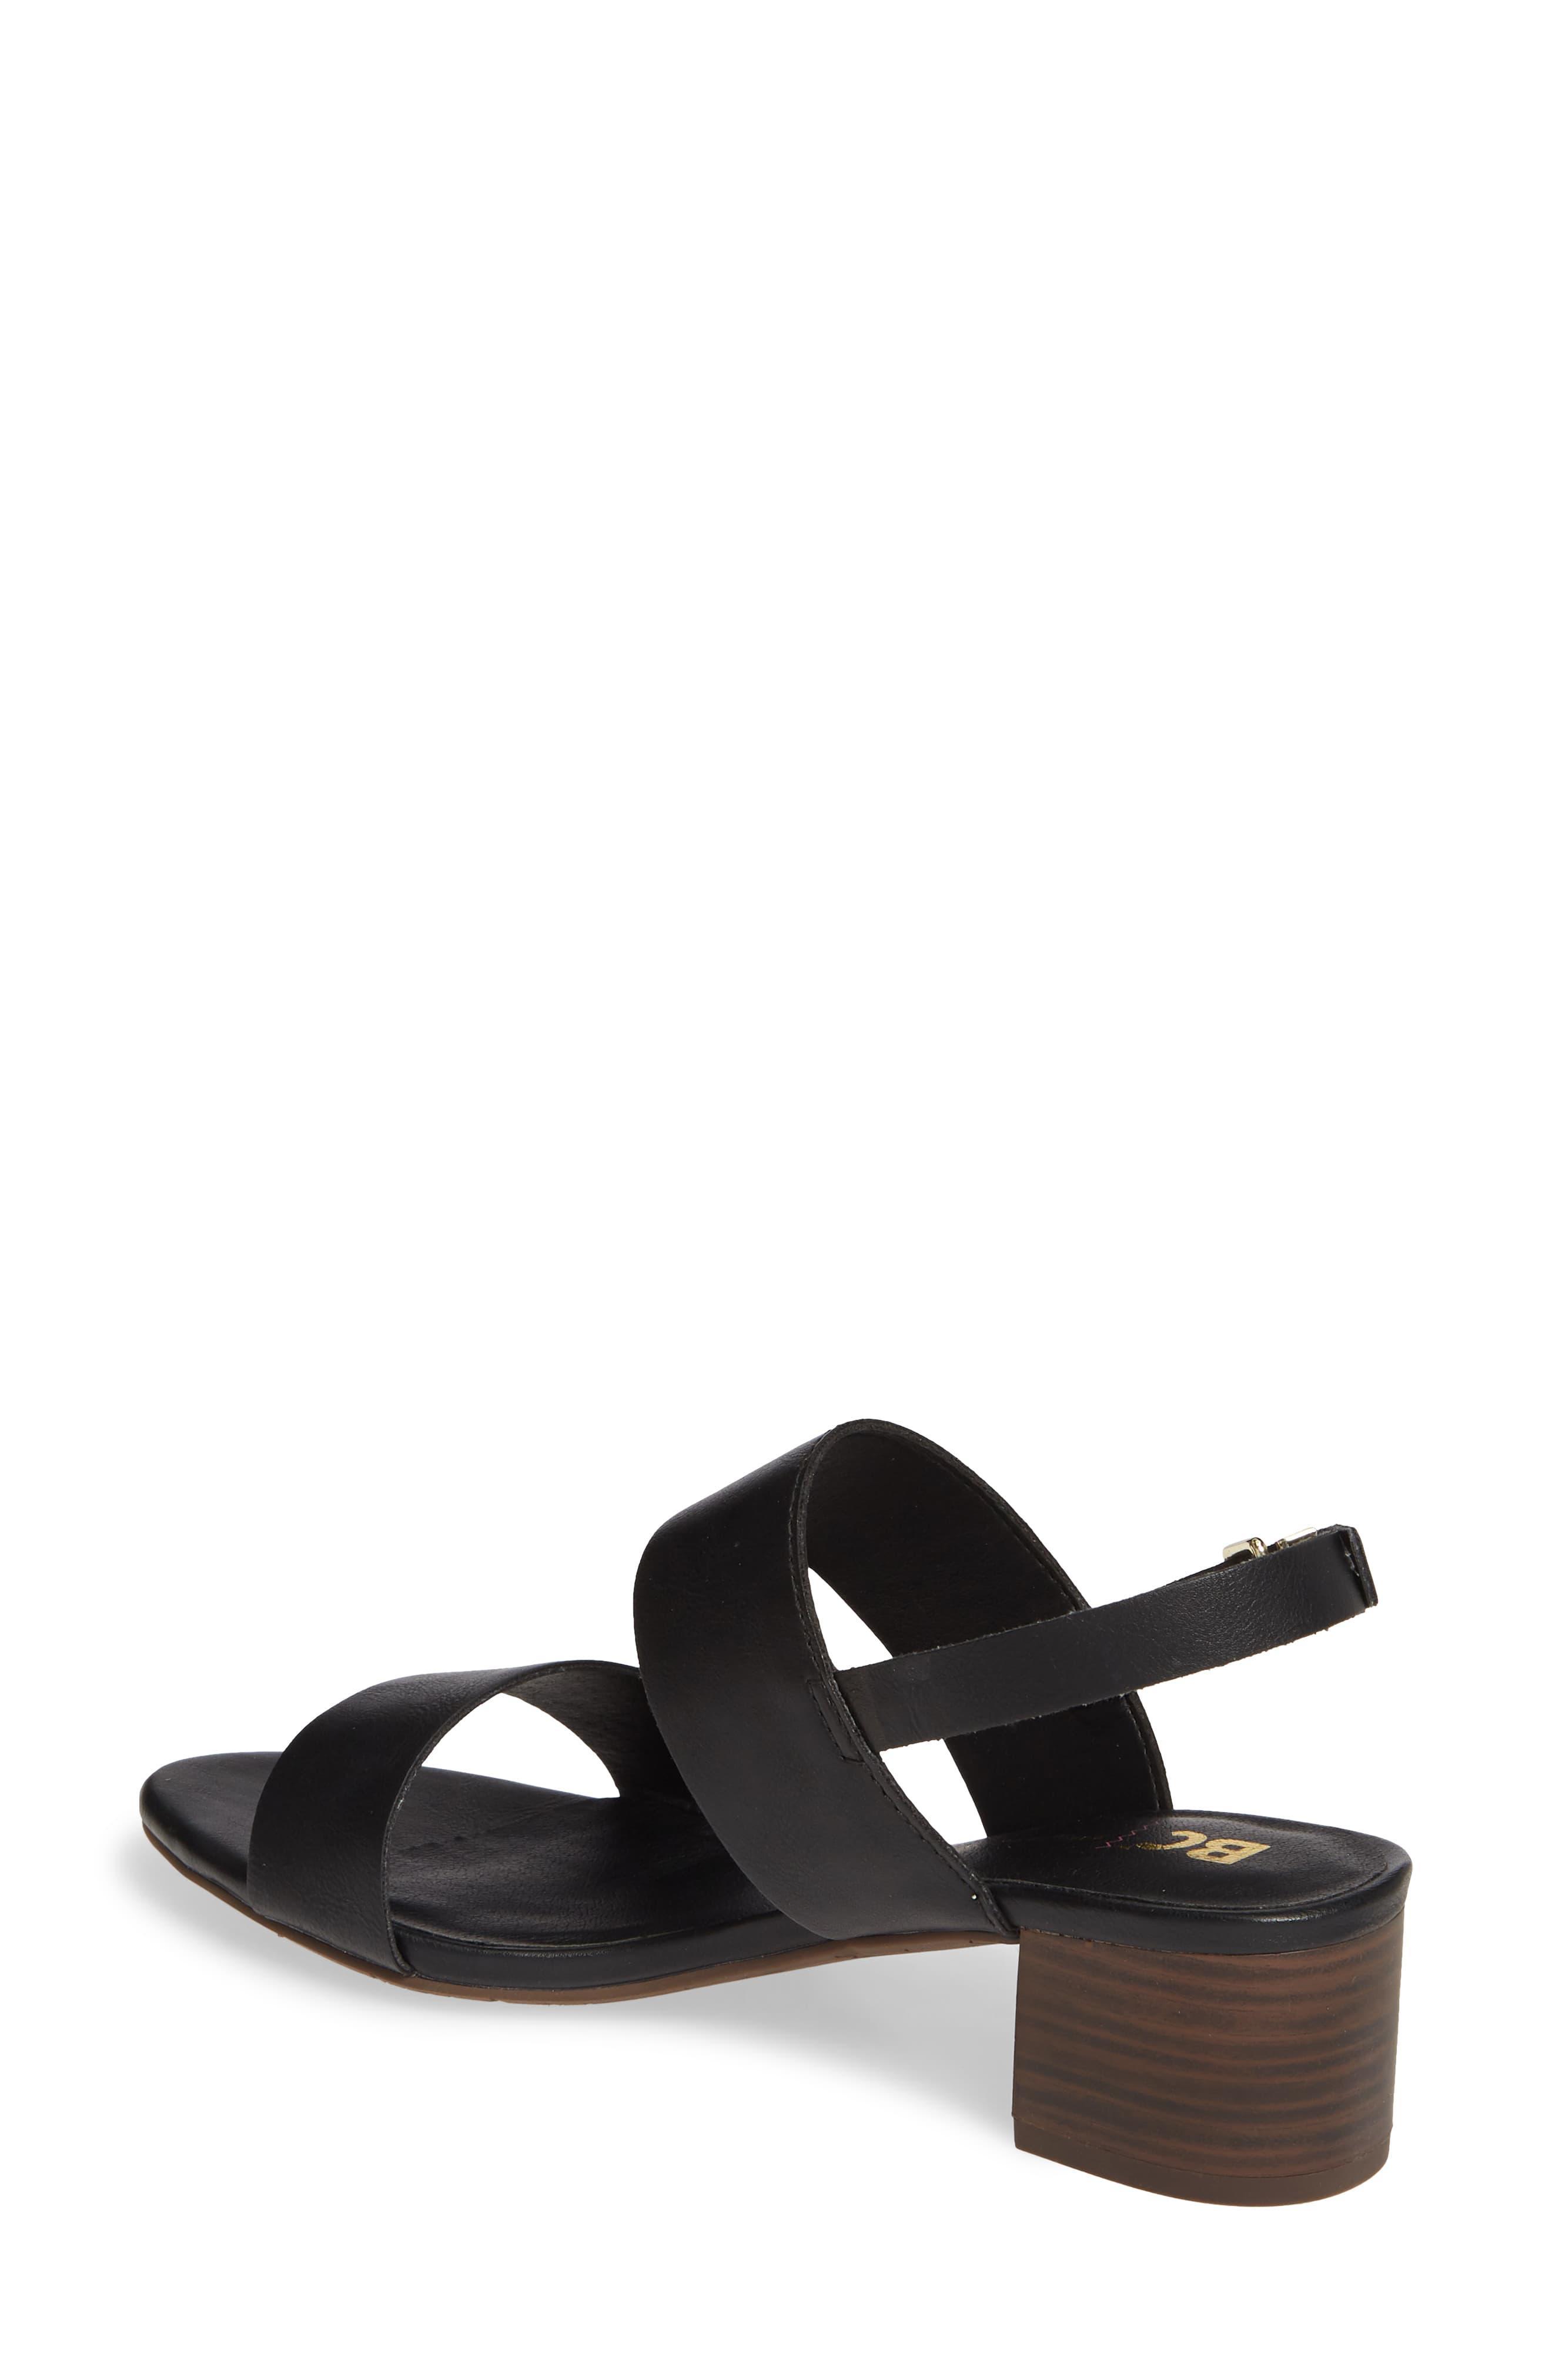 4231ce9f677b BC Footwear Gardenia Vegan Leather Sandal in Black - Lyst